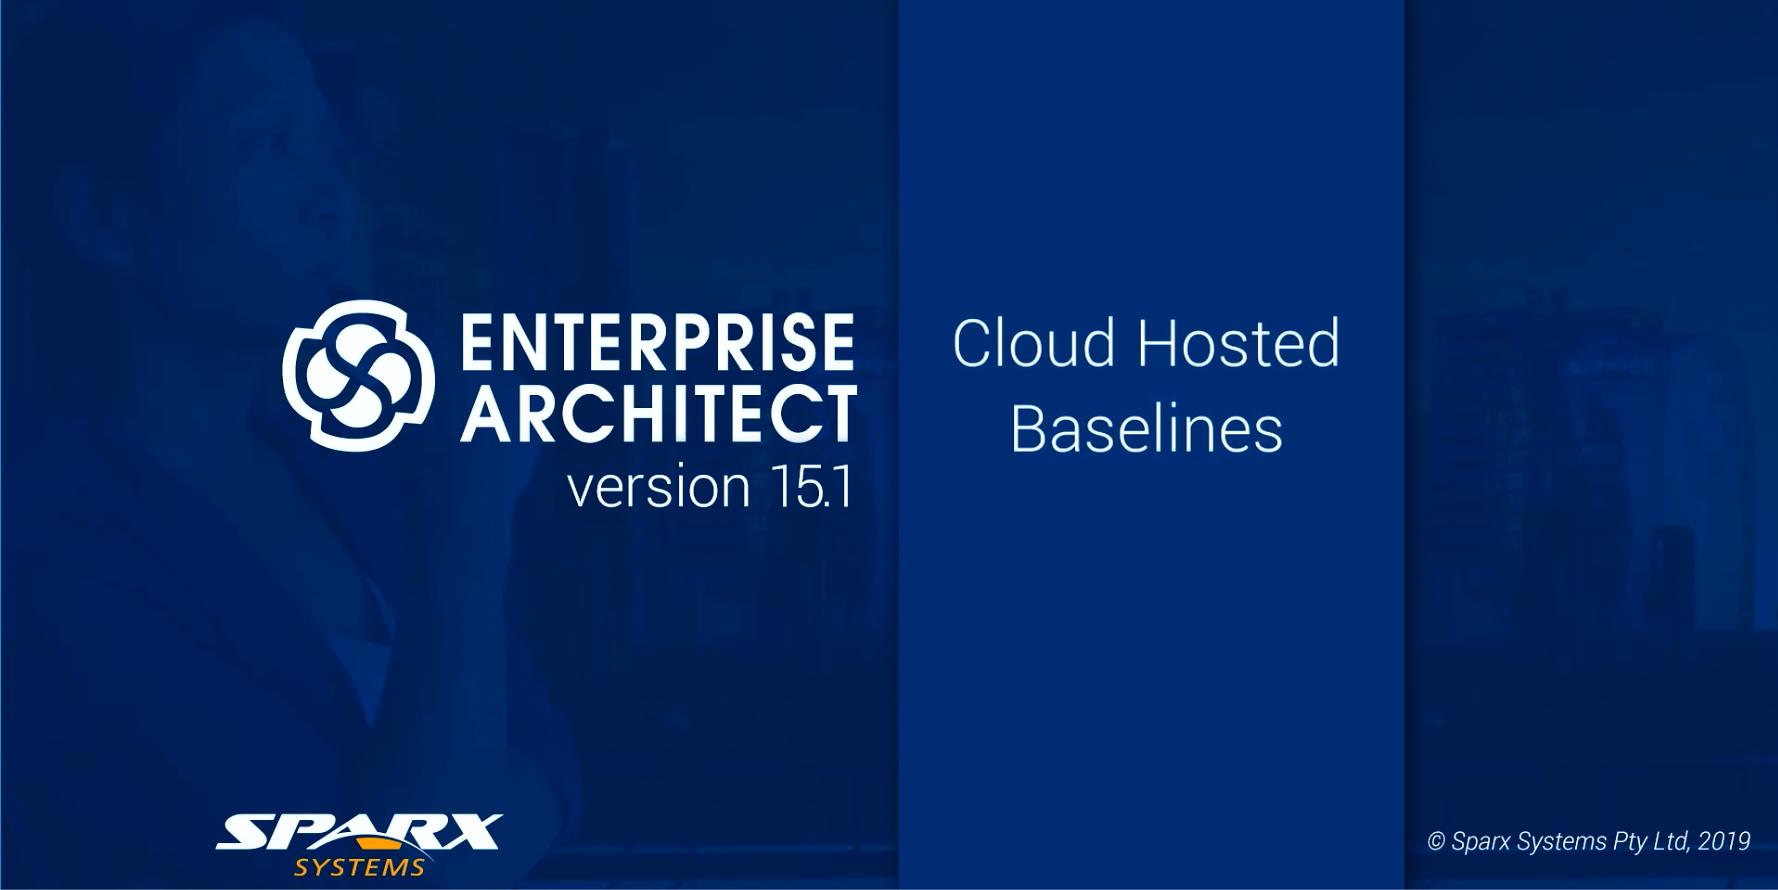 Enterprise Architect版本15.1功能解析(四):多个人同时在同一基础模型上工作